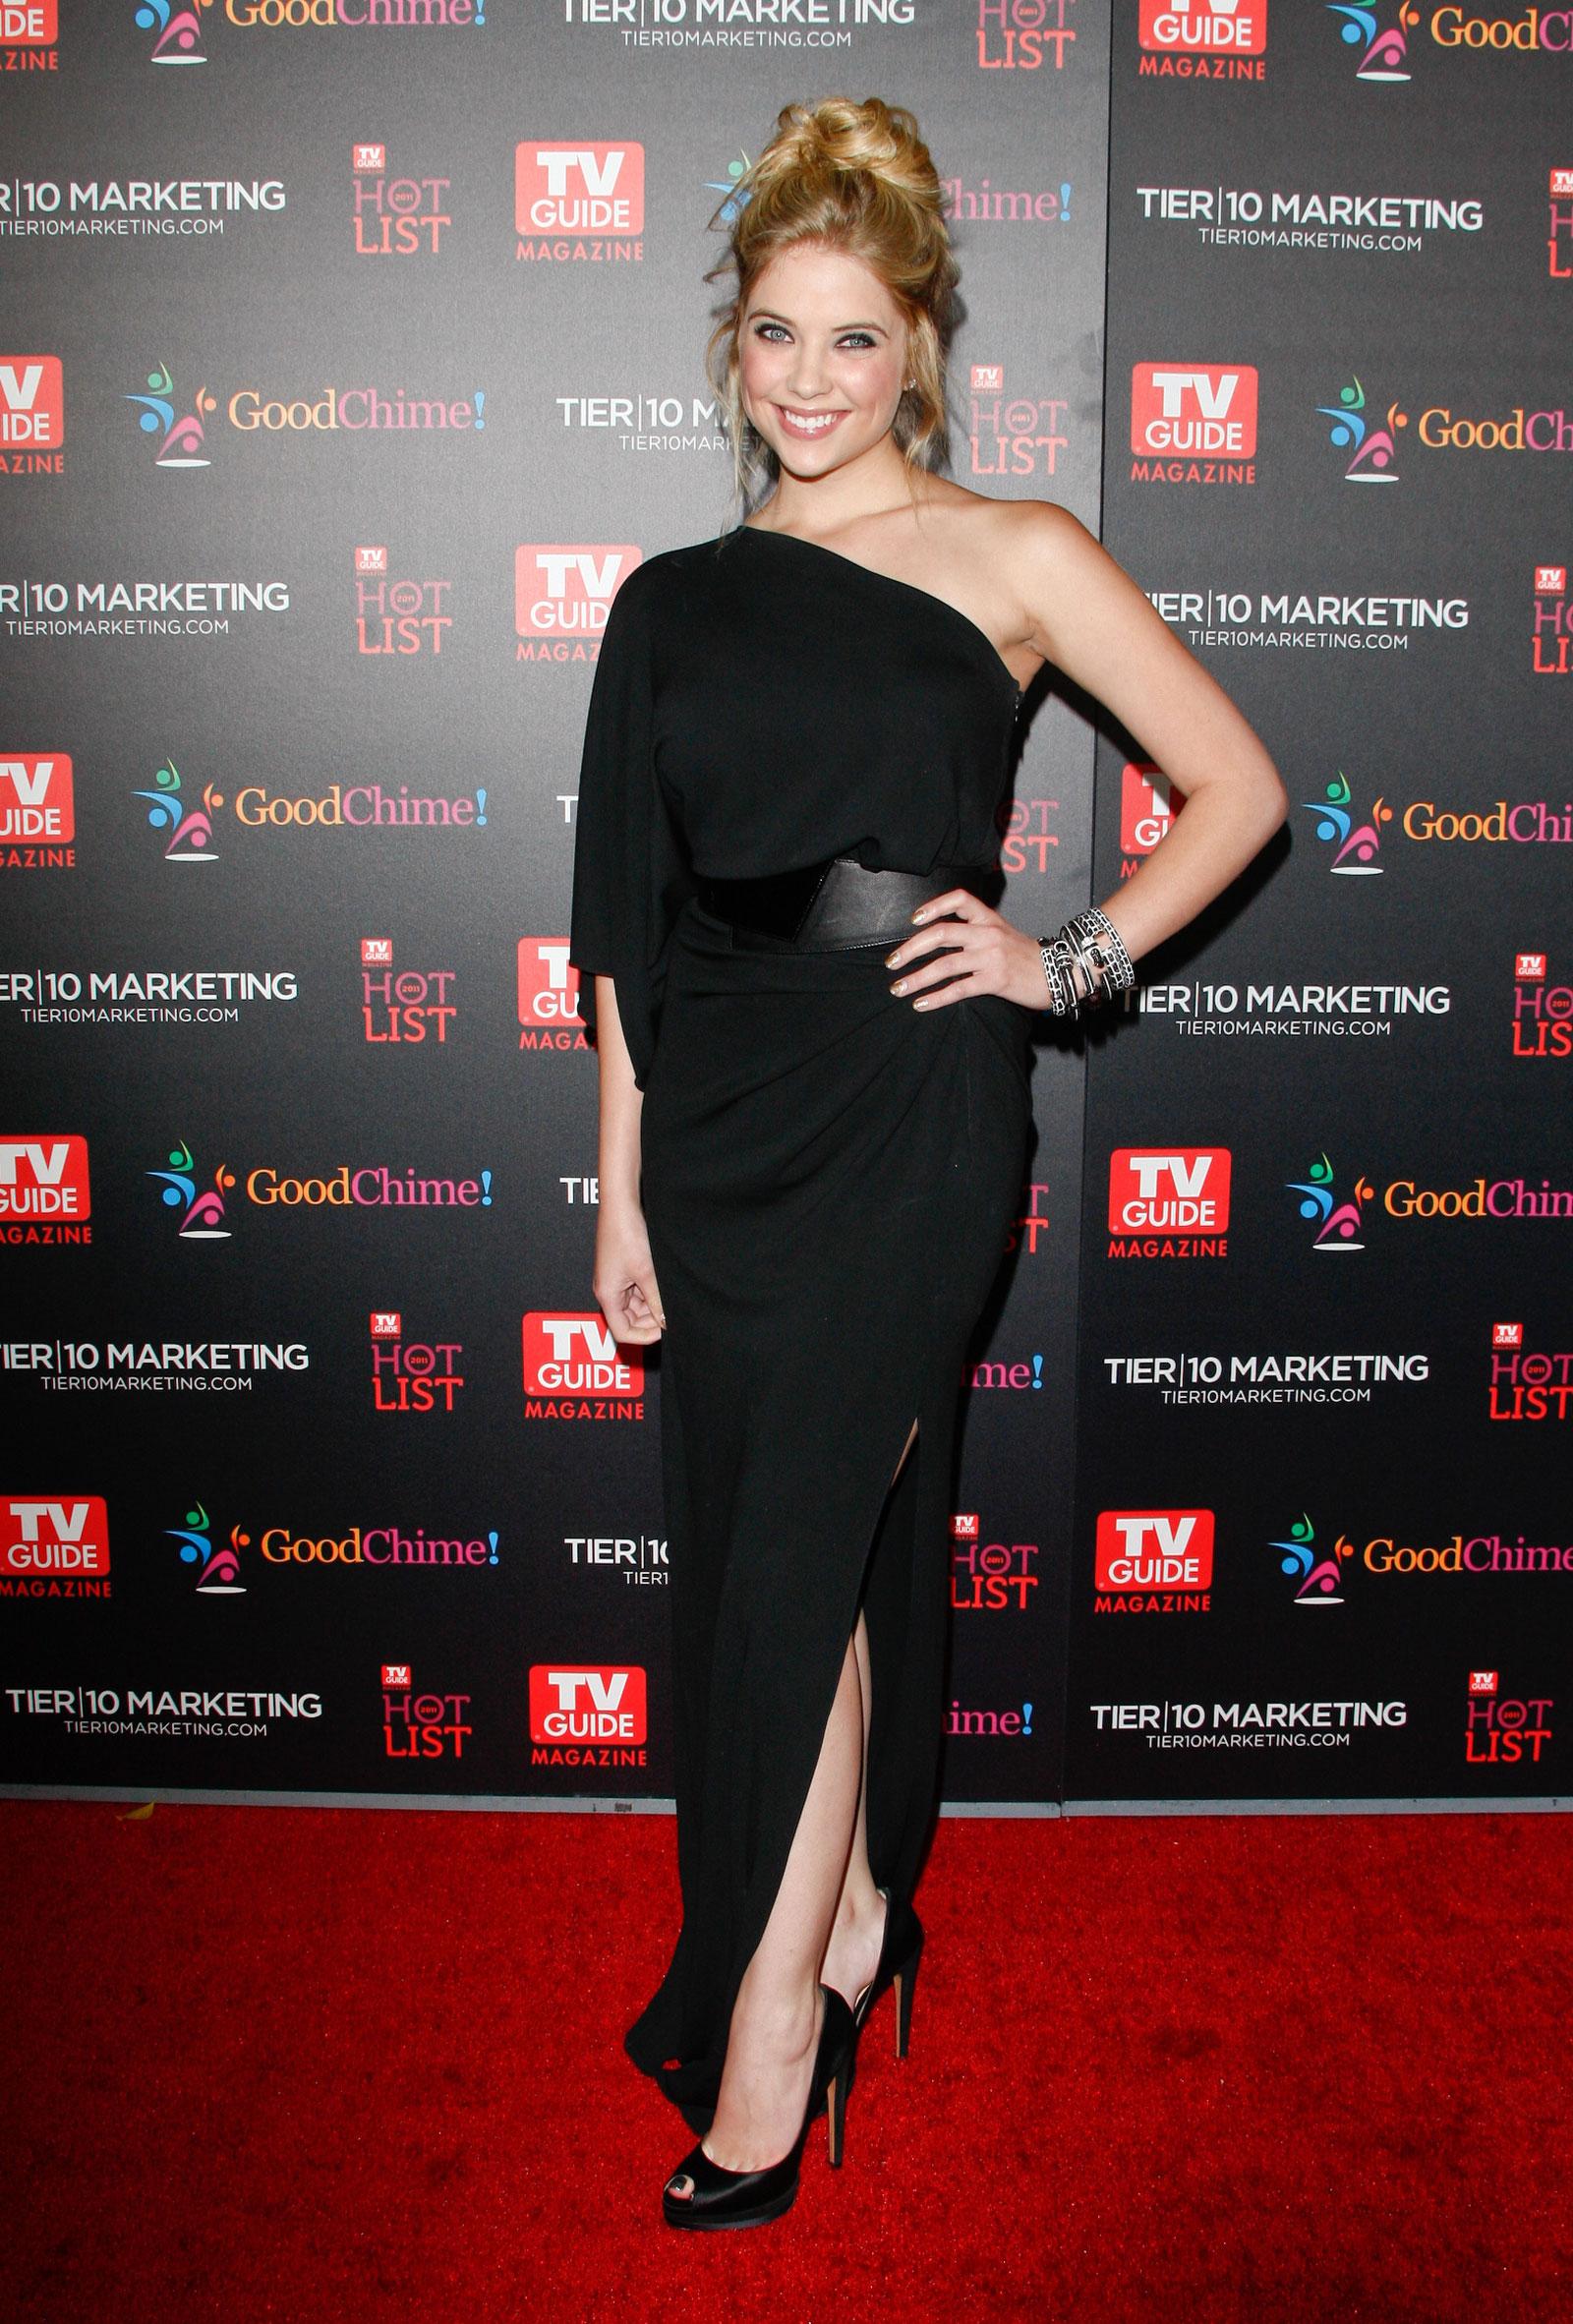 Ashley benson in black dress